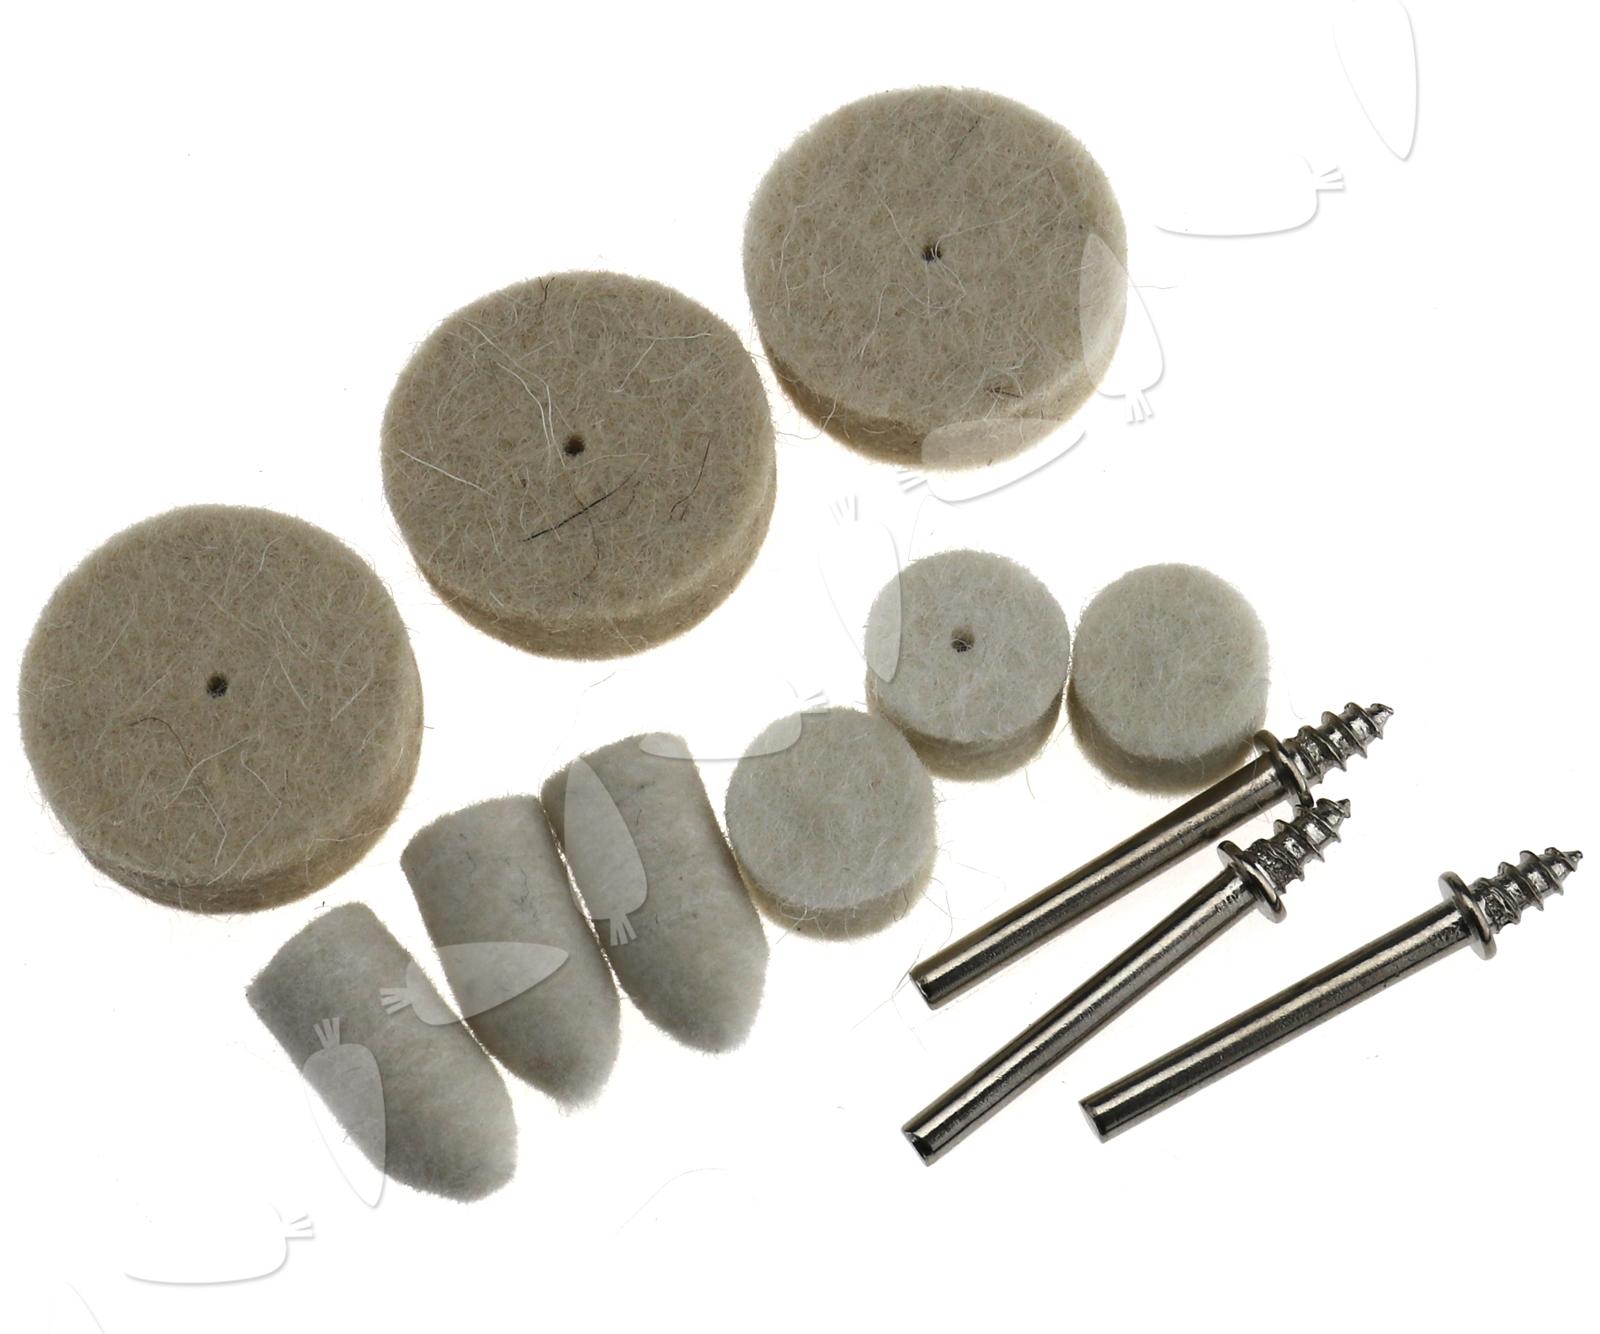 how to clean wool polishing pads machine